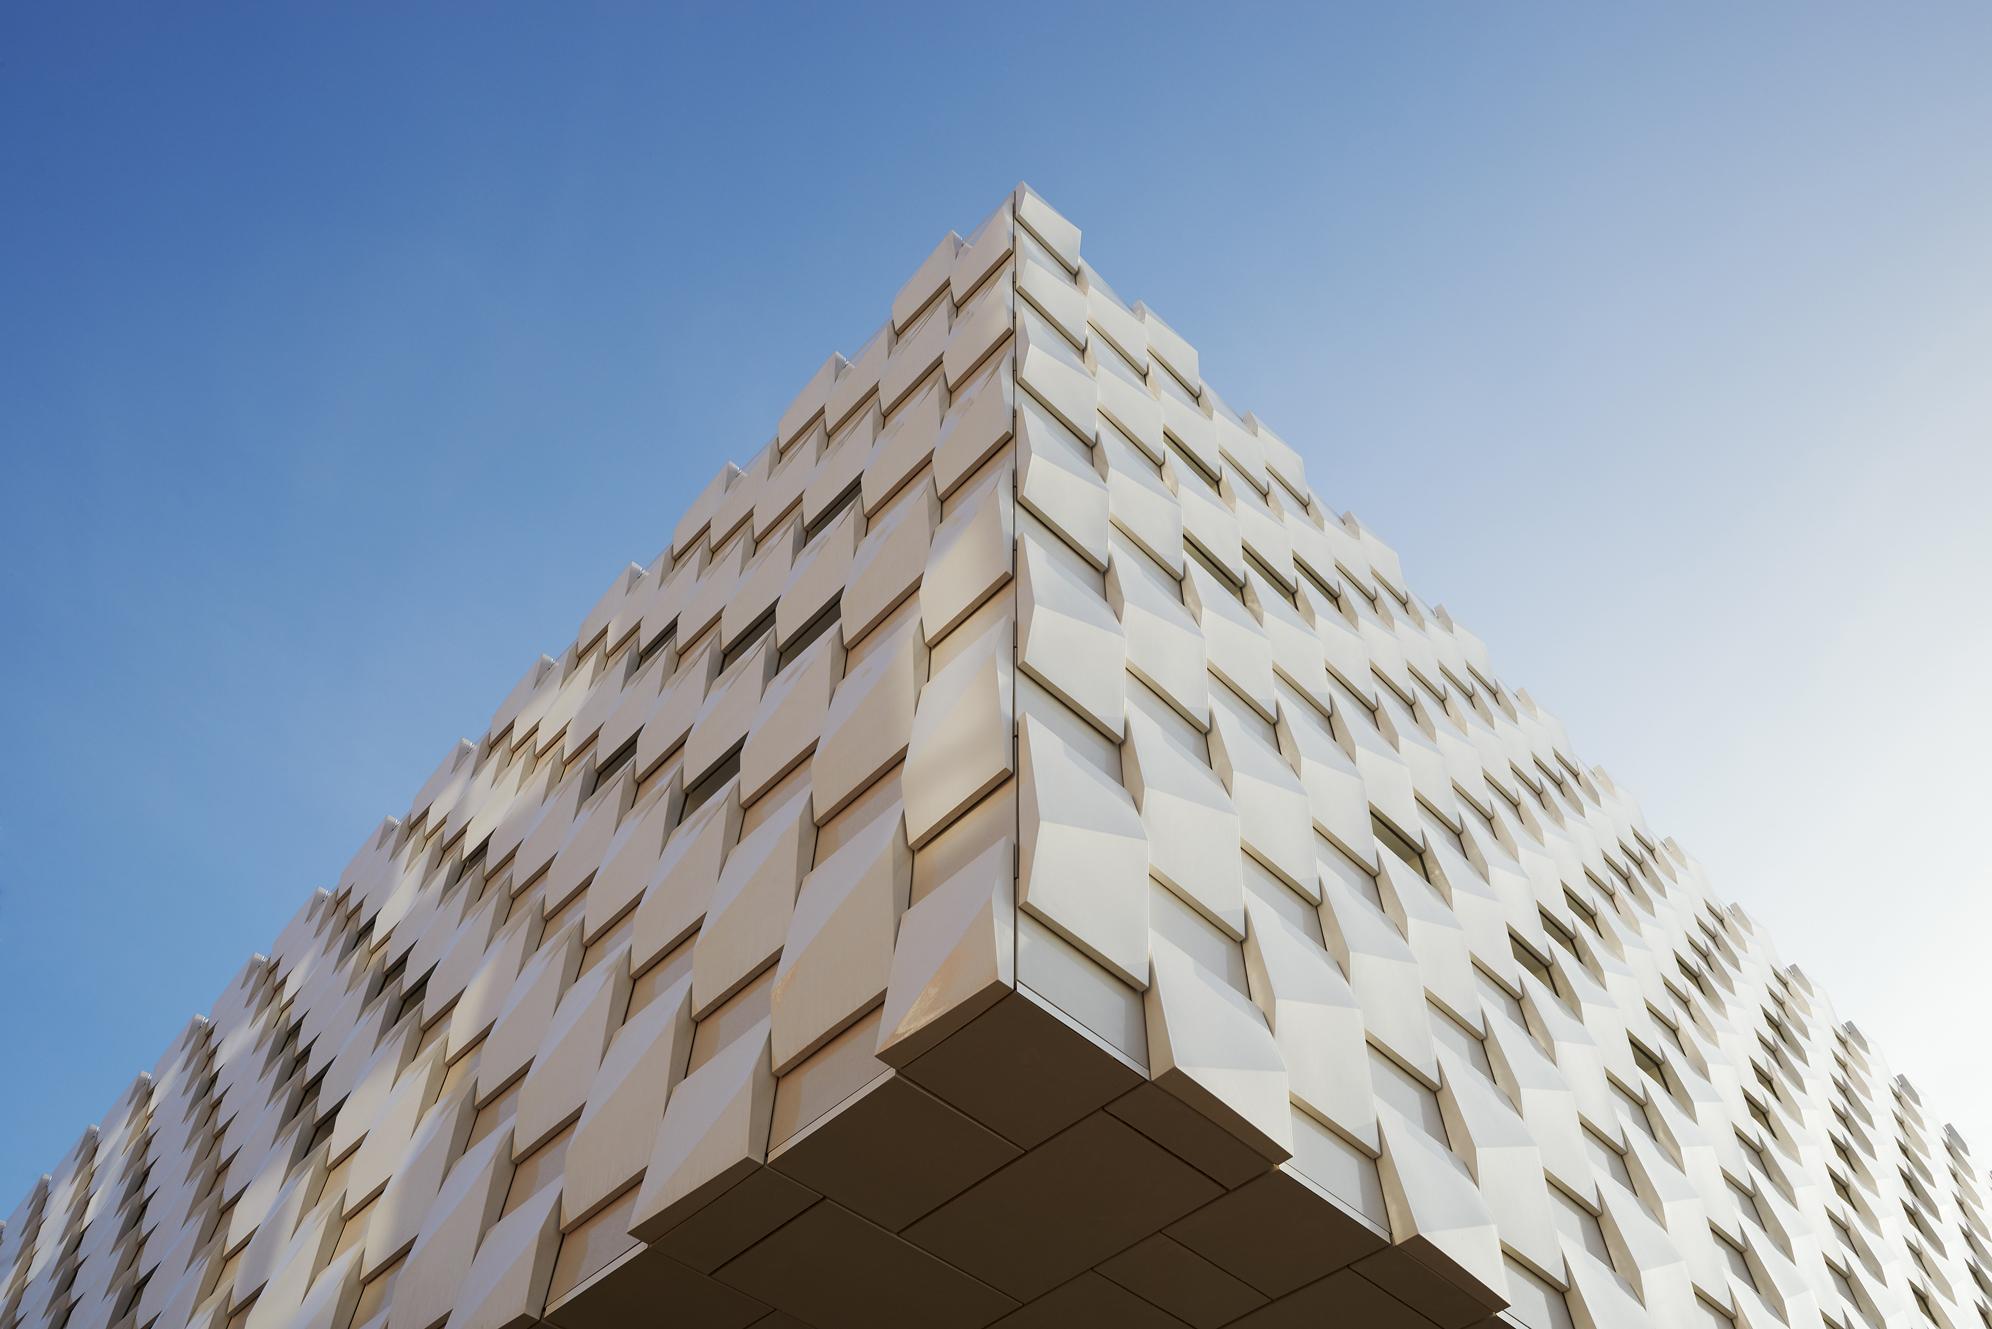 Architectural Terracotta